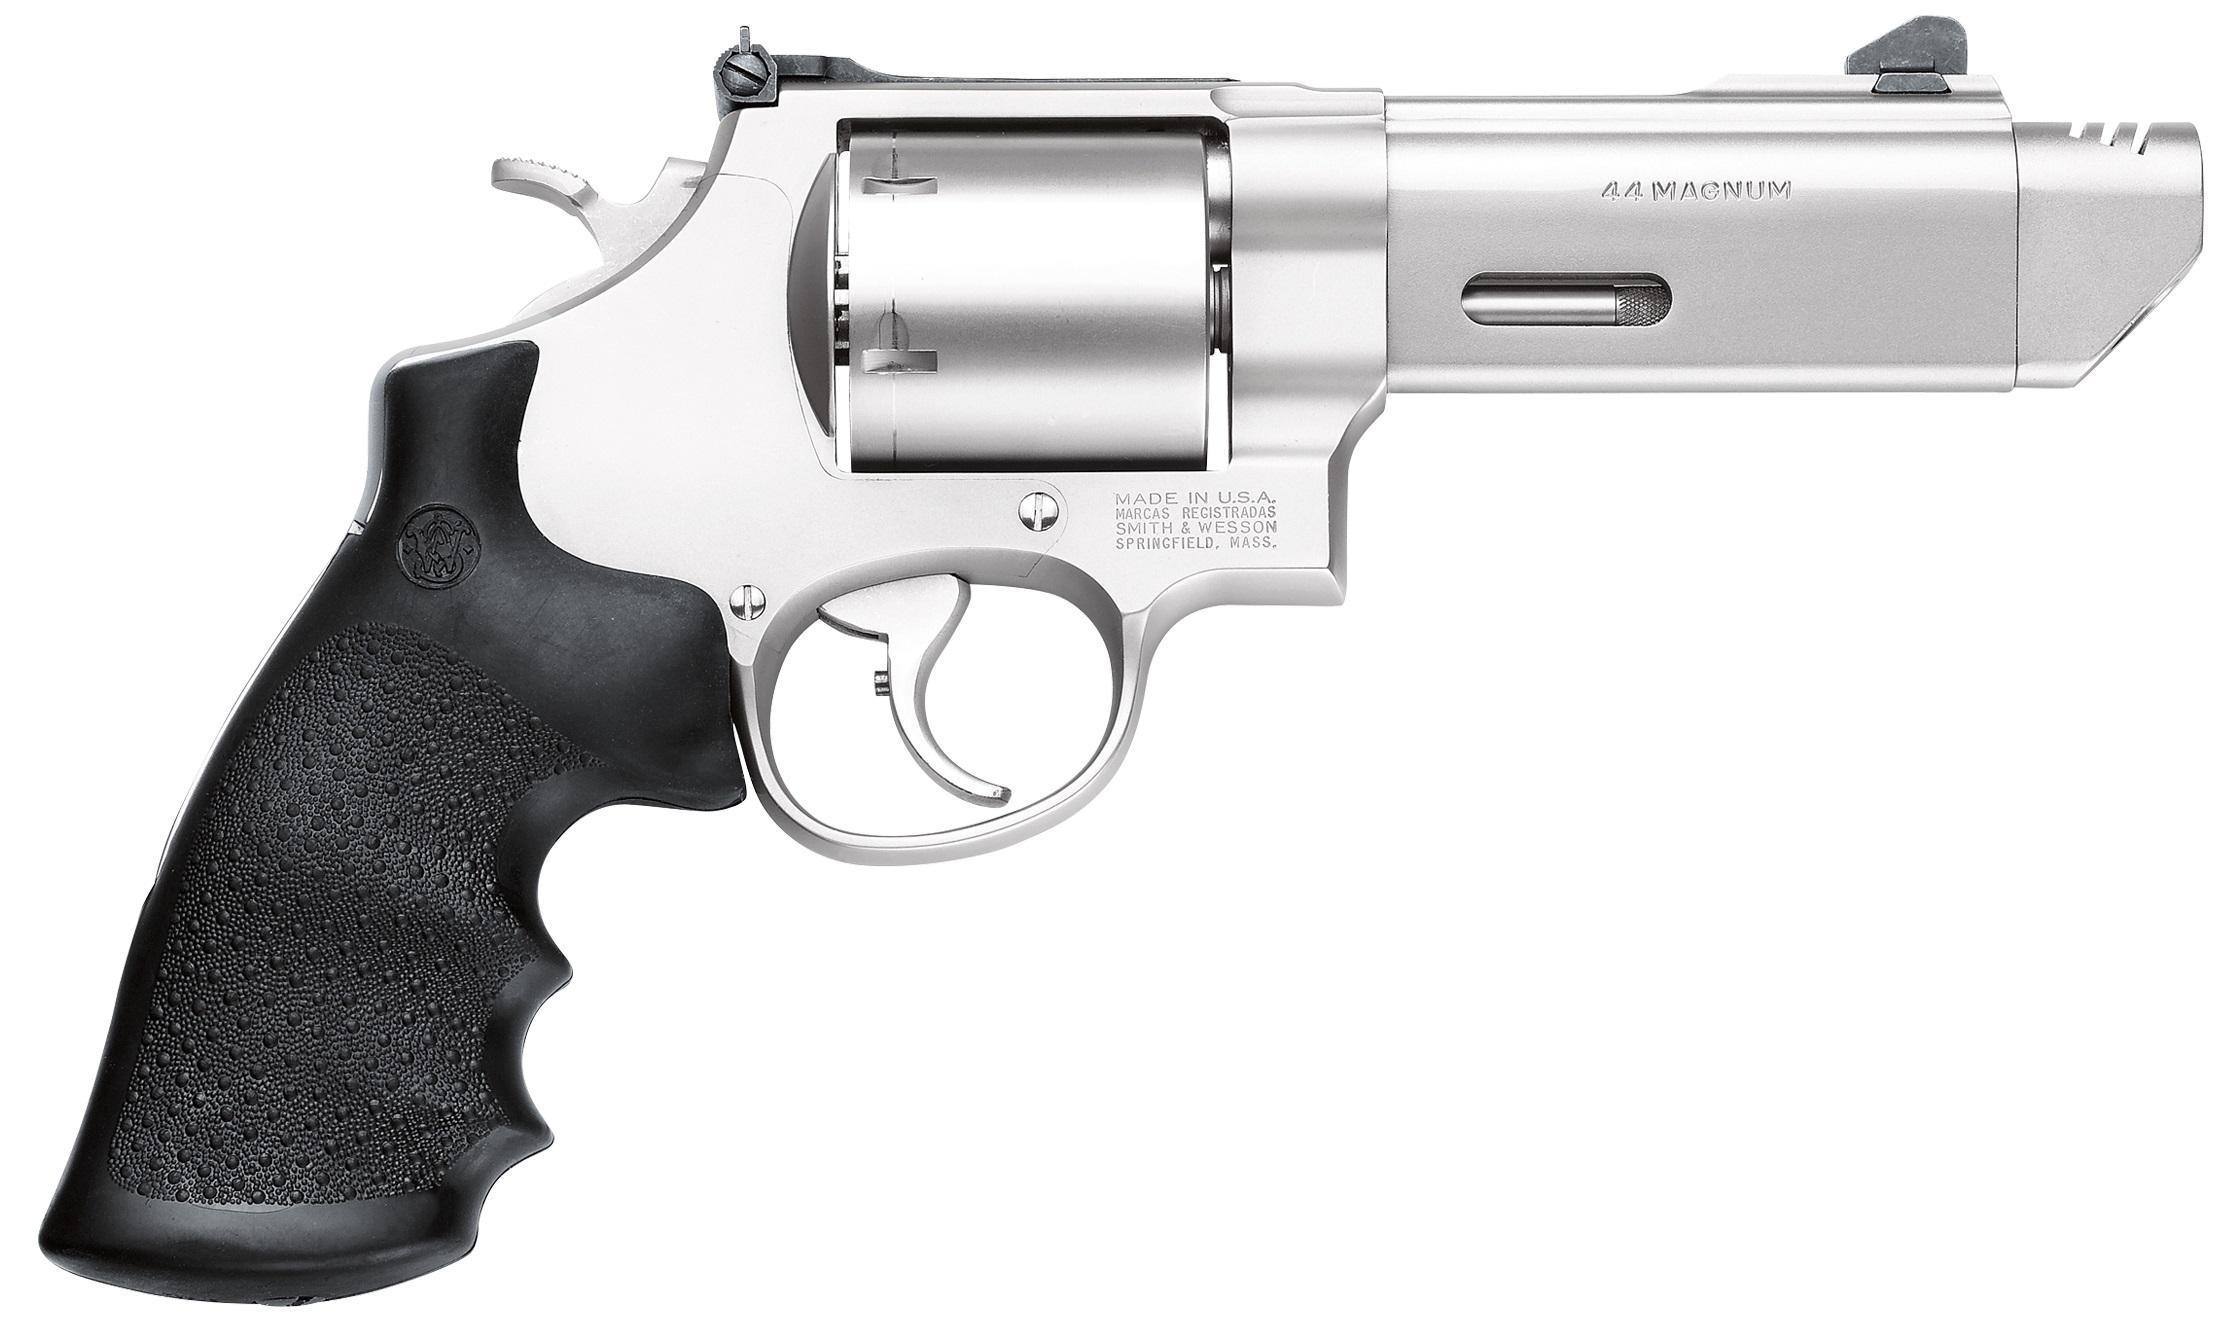 Smith and Wesson 629 V-COMP 44 MAGNUM | 44 SPECIAL